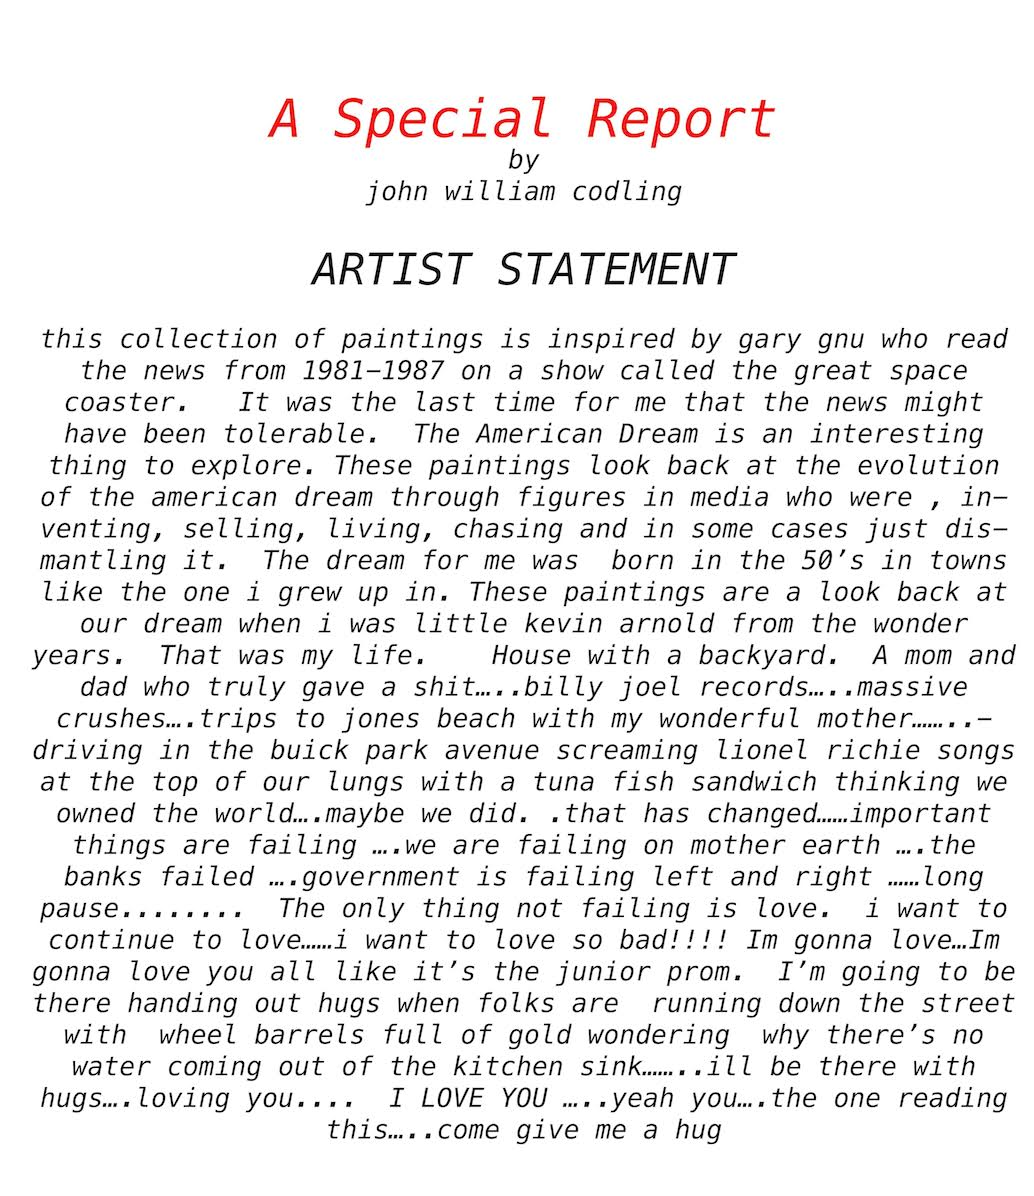 aspecialreport